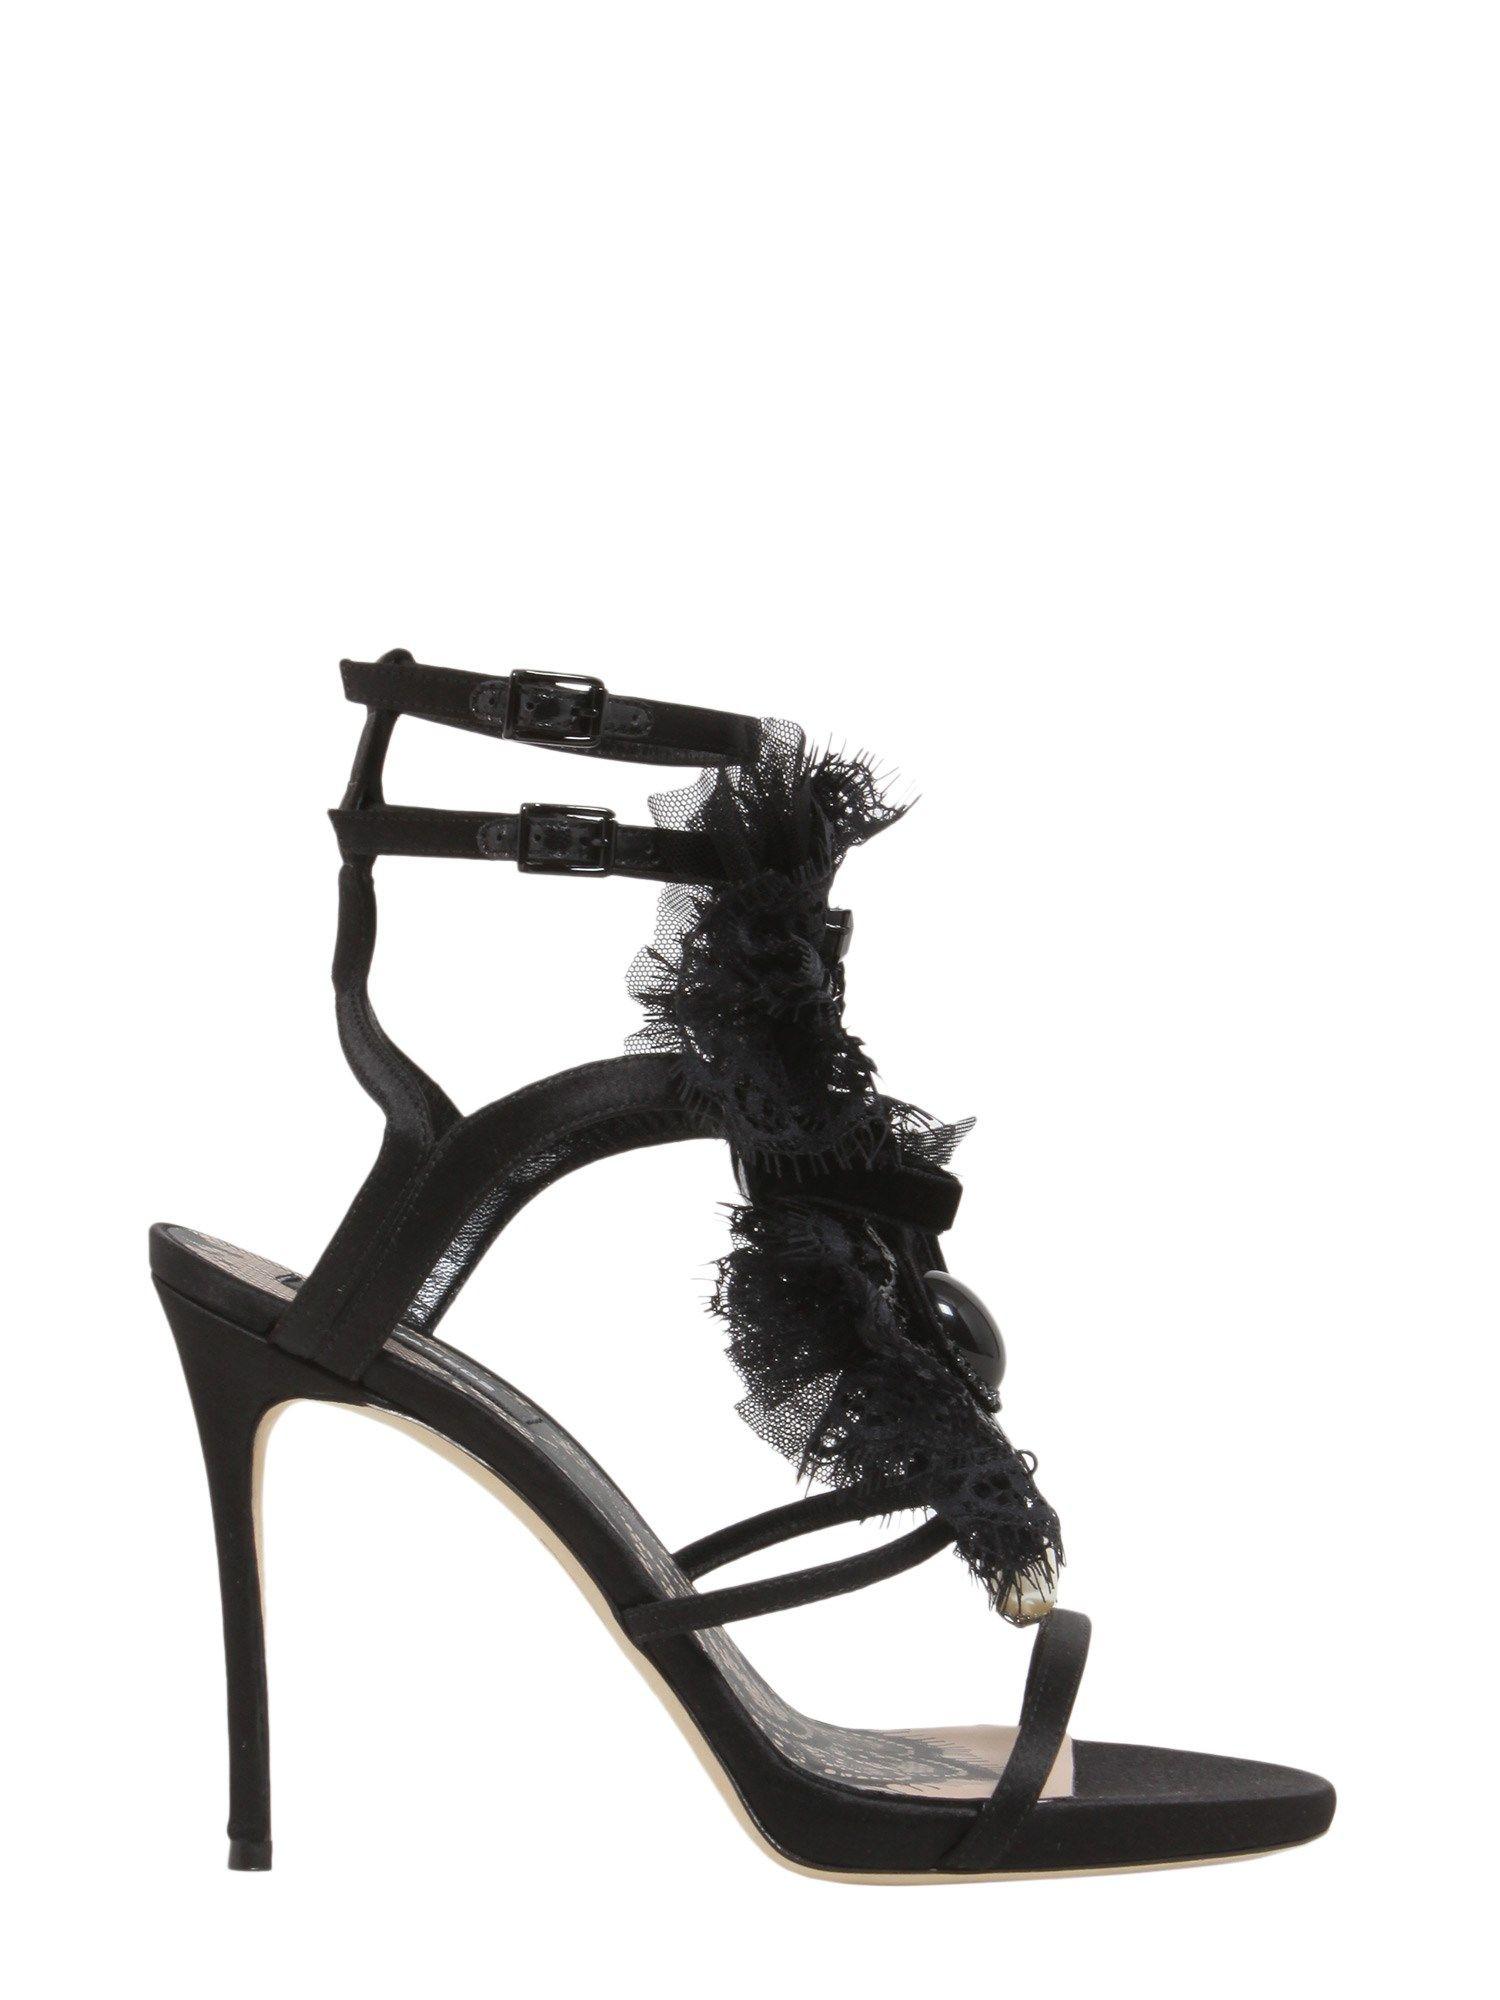 Victorian Sandal